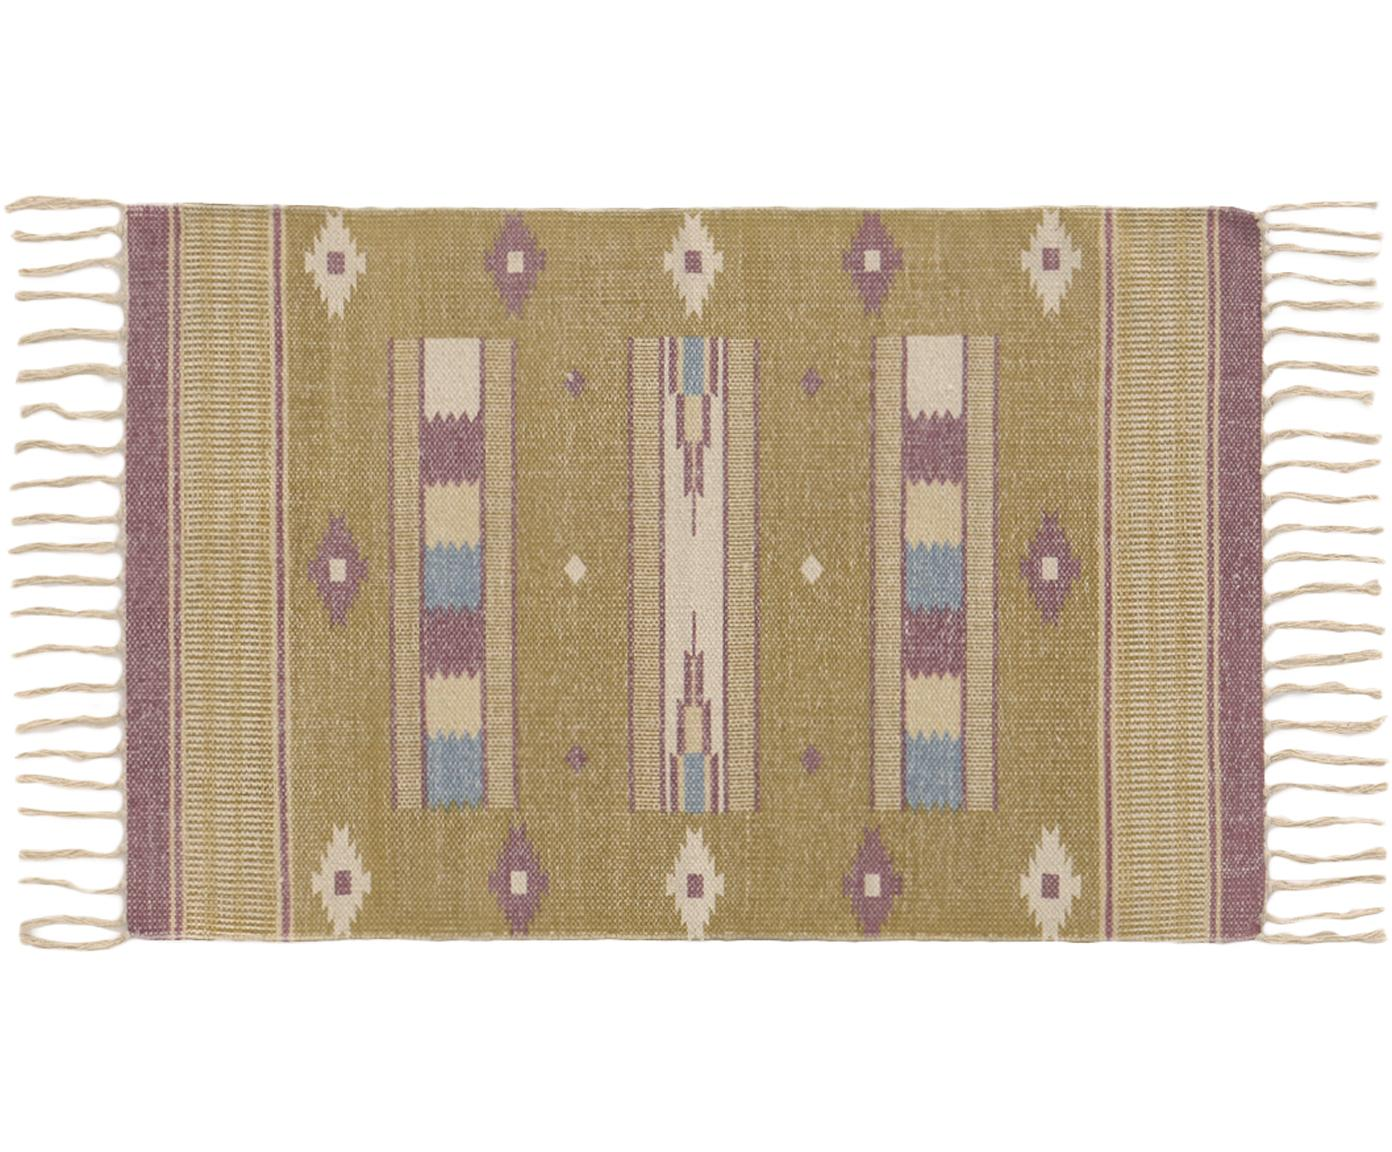 Teppich Kamel im Ethno Style, 100% Baumwolle, Senfgelb, Beige, Lila, Blau, B 60 x L 90 cm (Größe XXS)